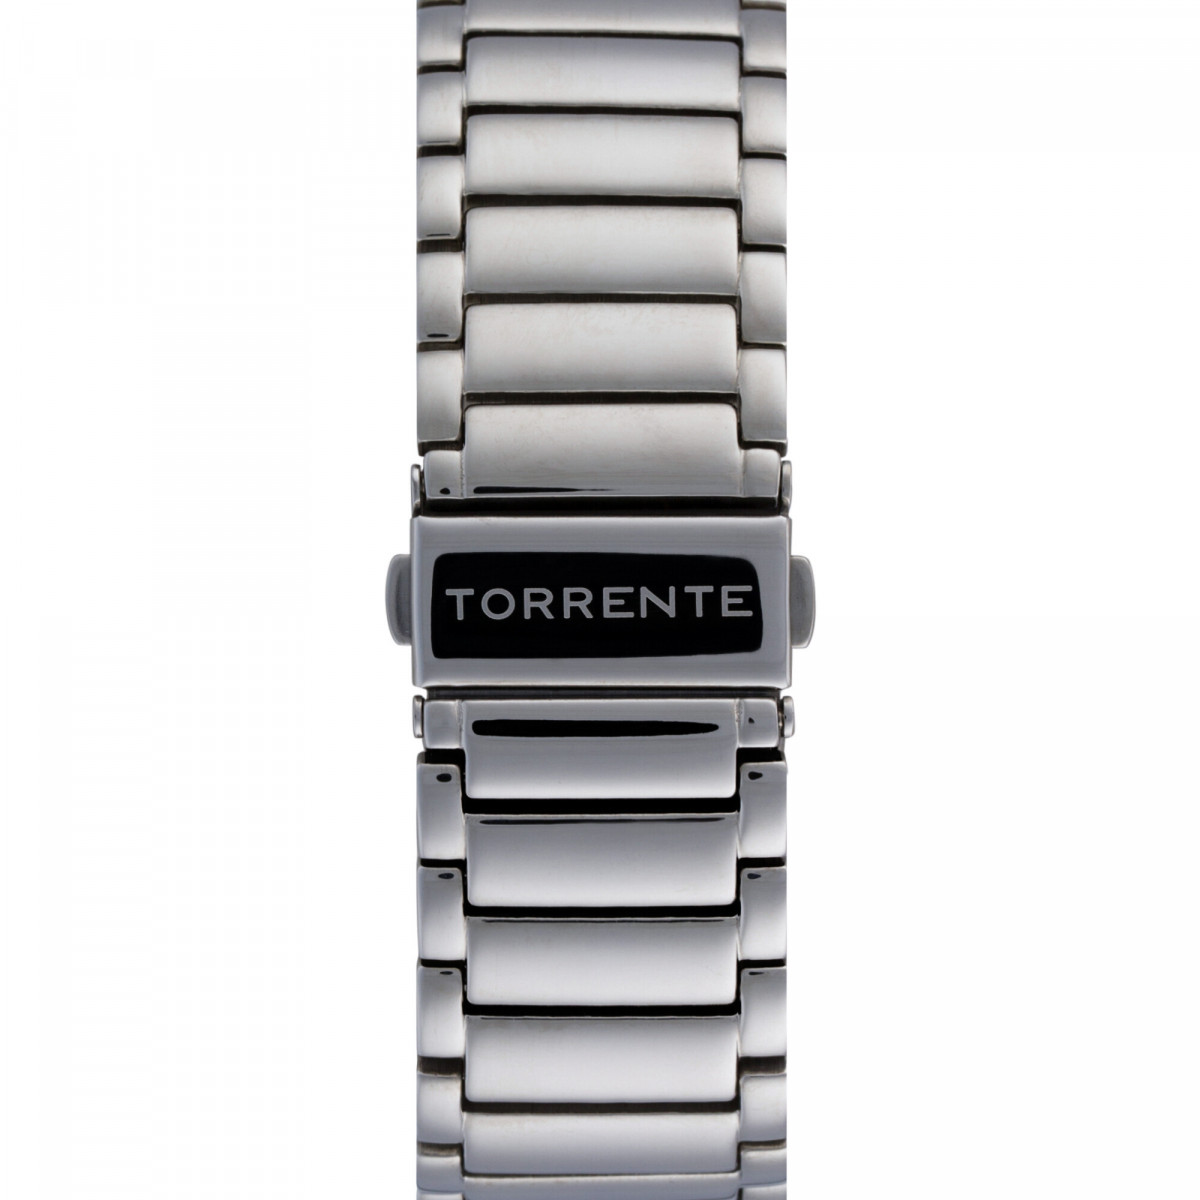 "Torrente - Montre Homme ""MOMENTO"" Bracelet Acier - TF140C1BM1"